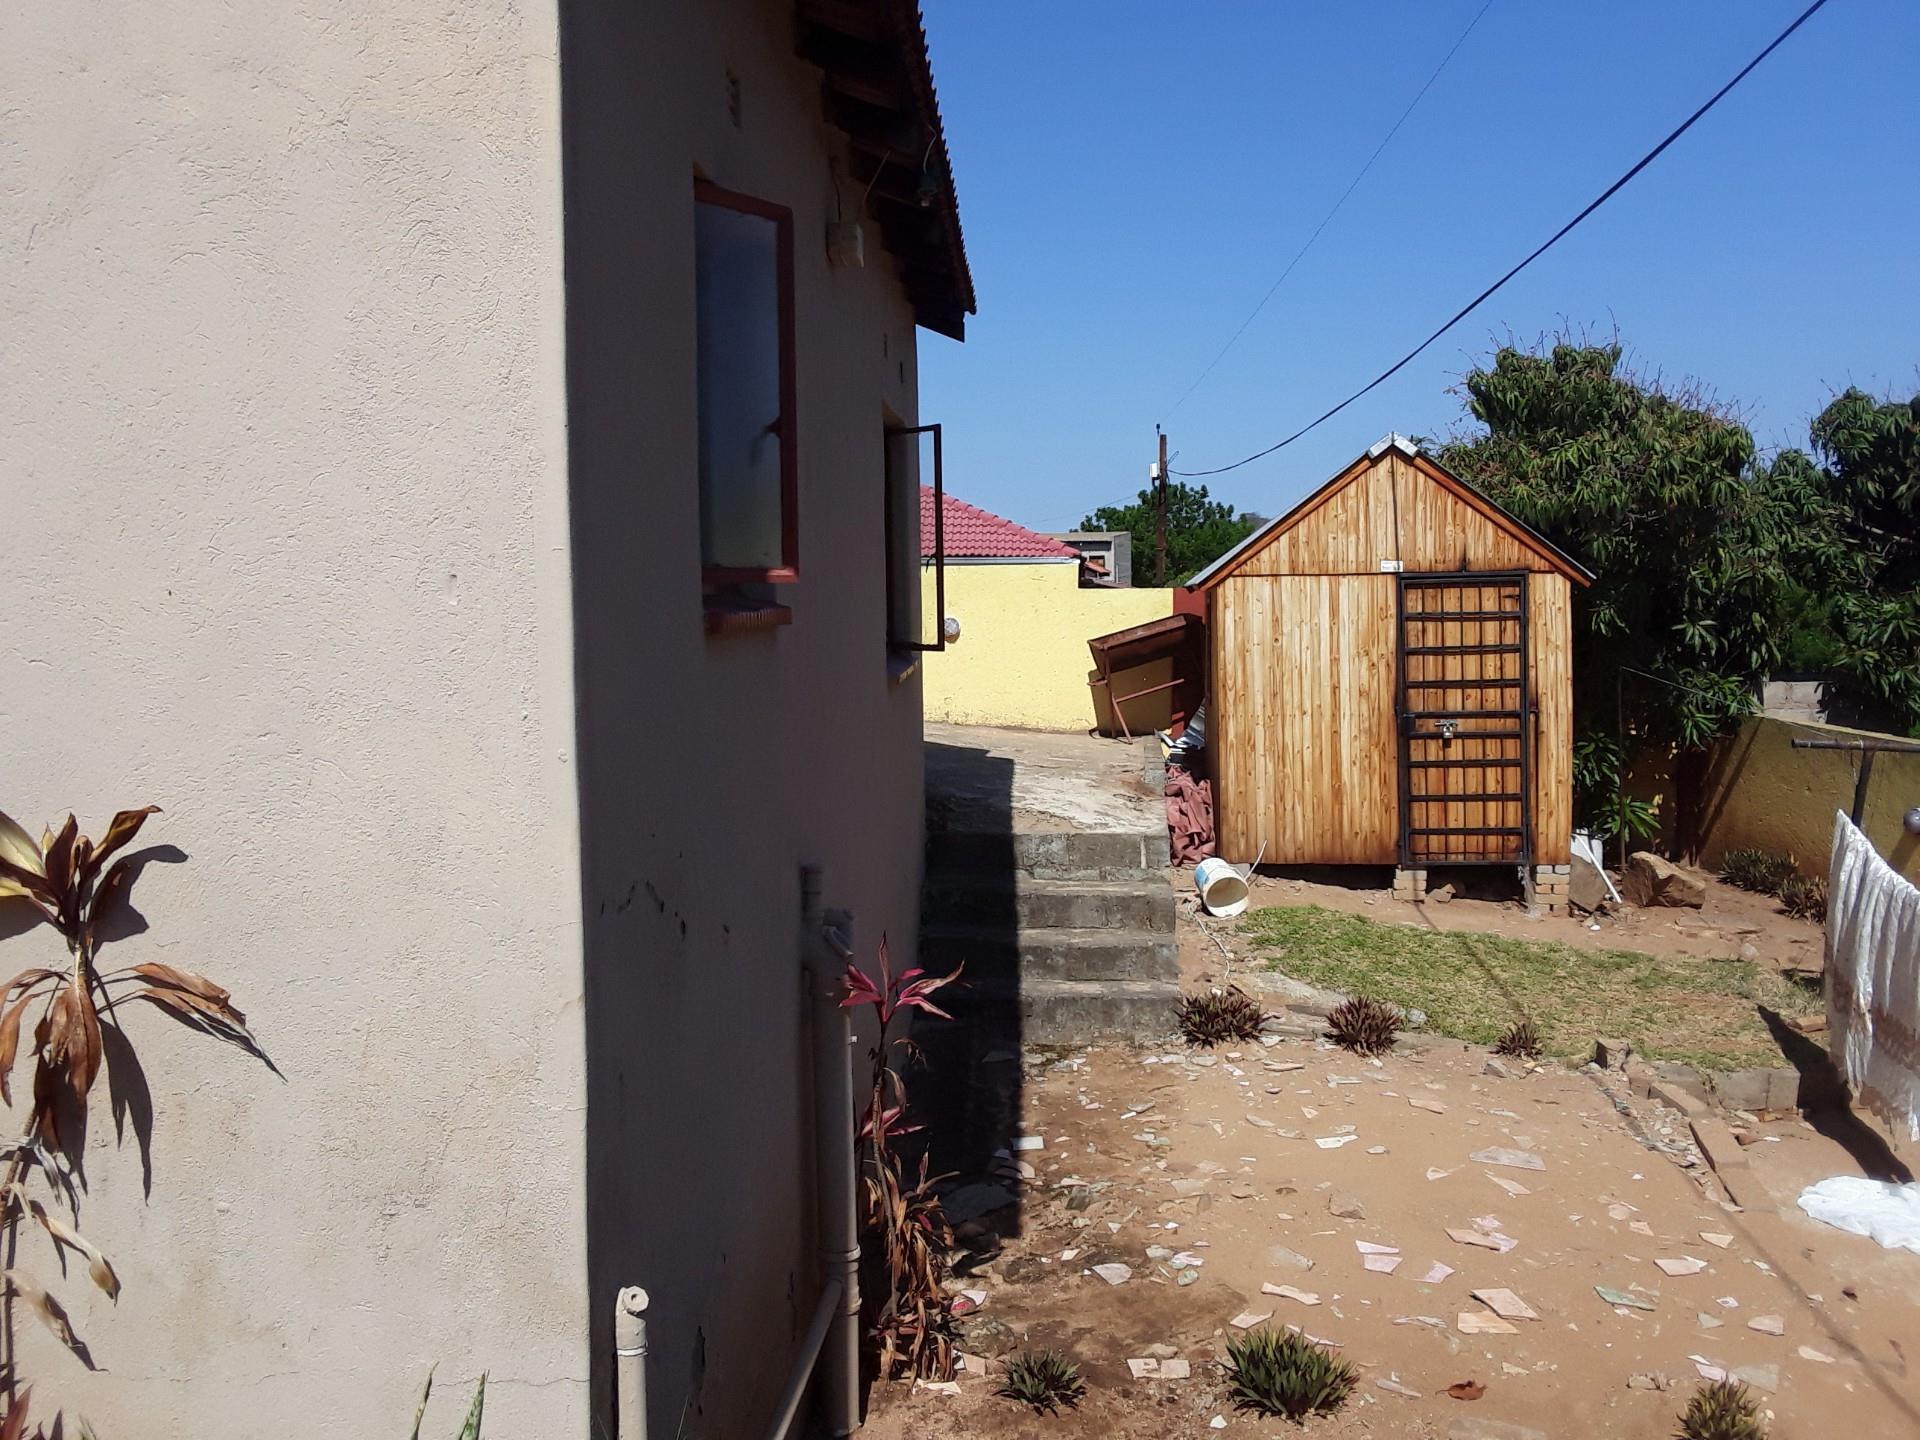 3 Bedroom House For Sale in Kamagugu